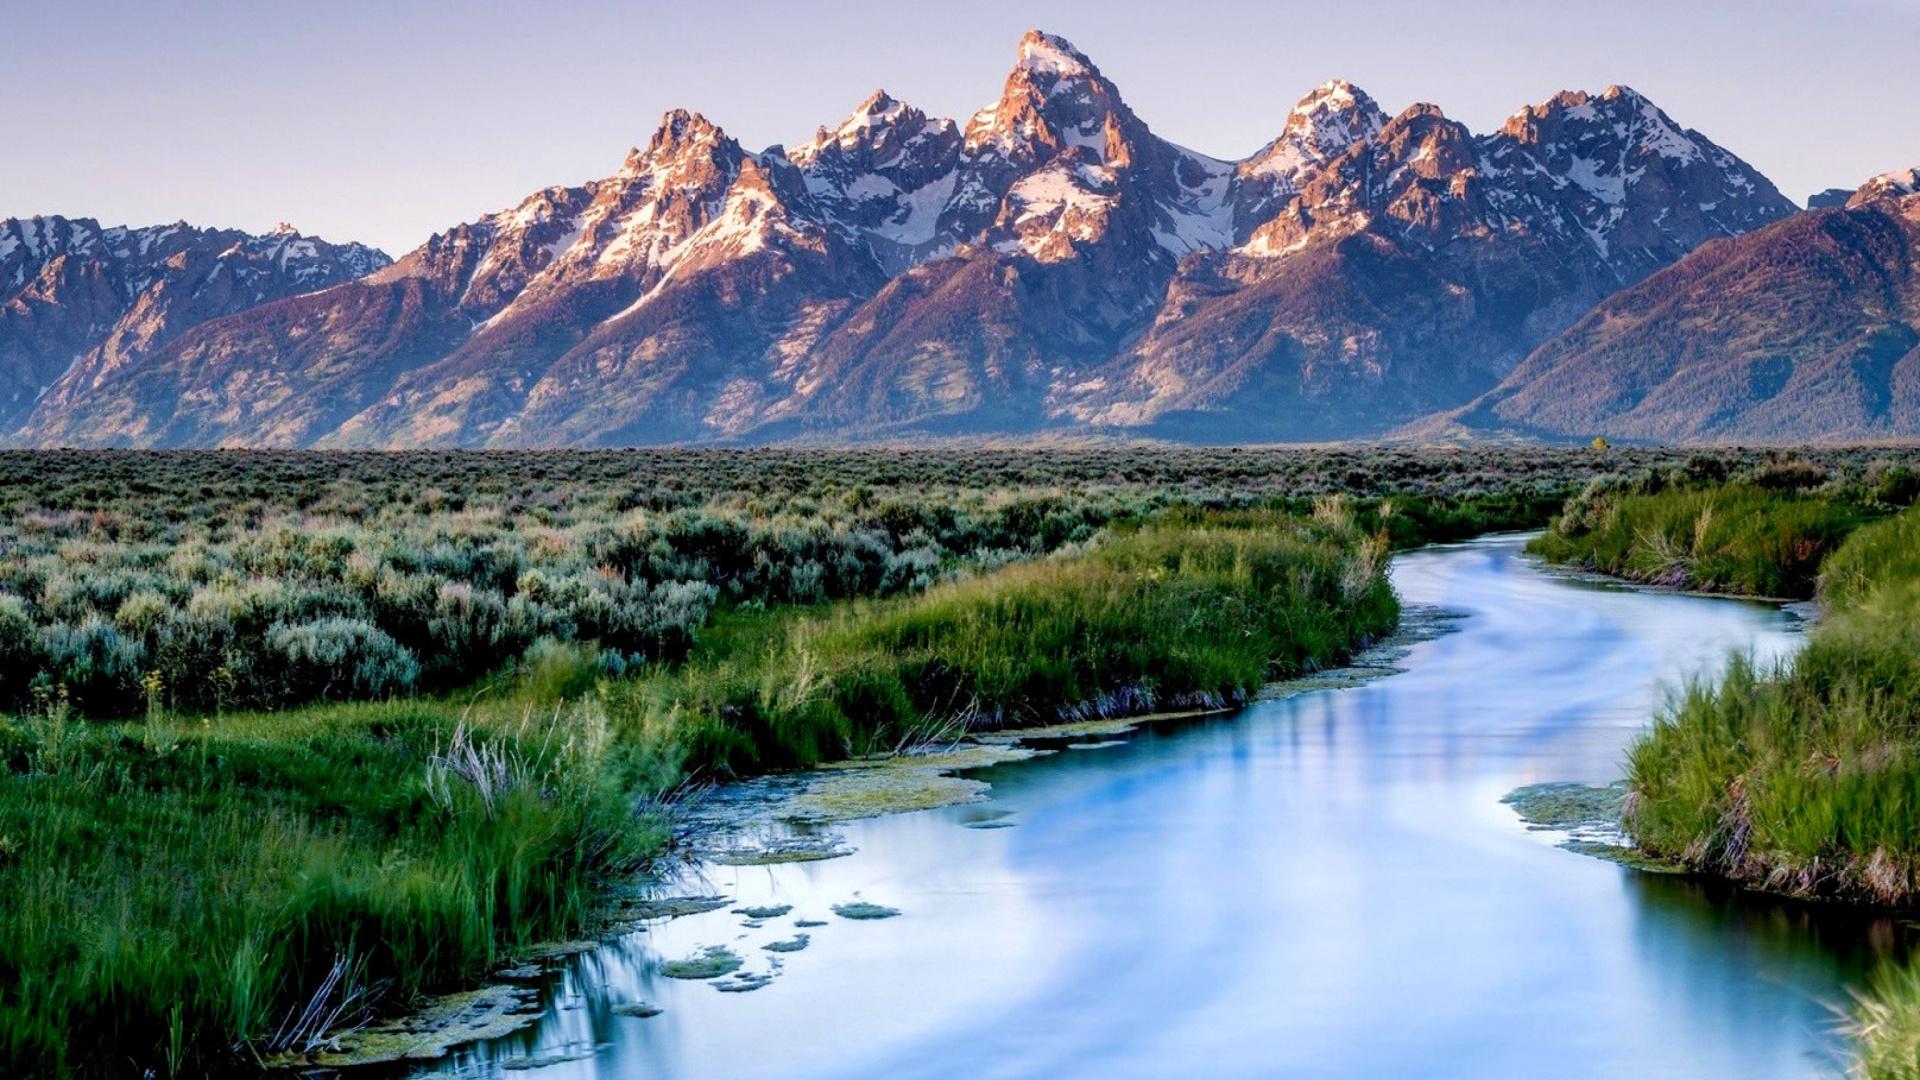 Best 40 Grand Teton National Park Desktop Backgrounds on 1920x1080